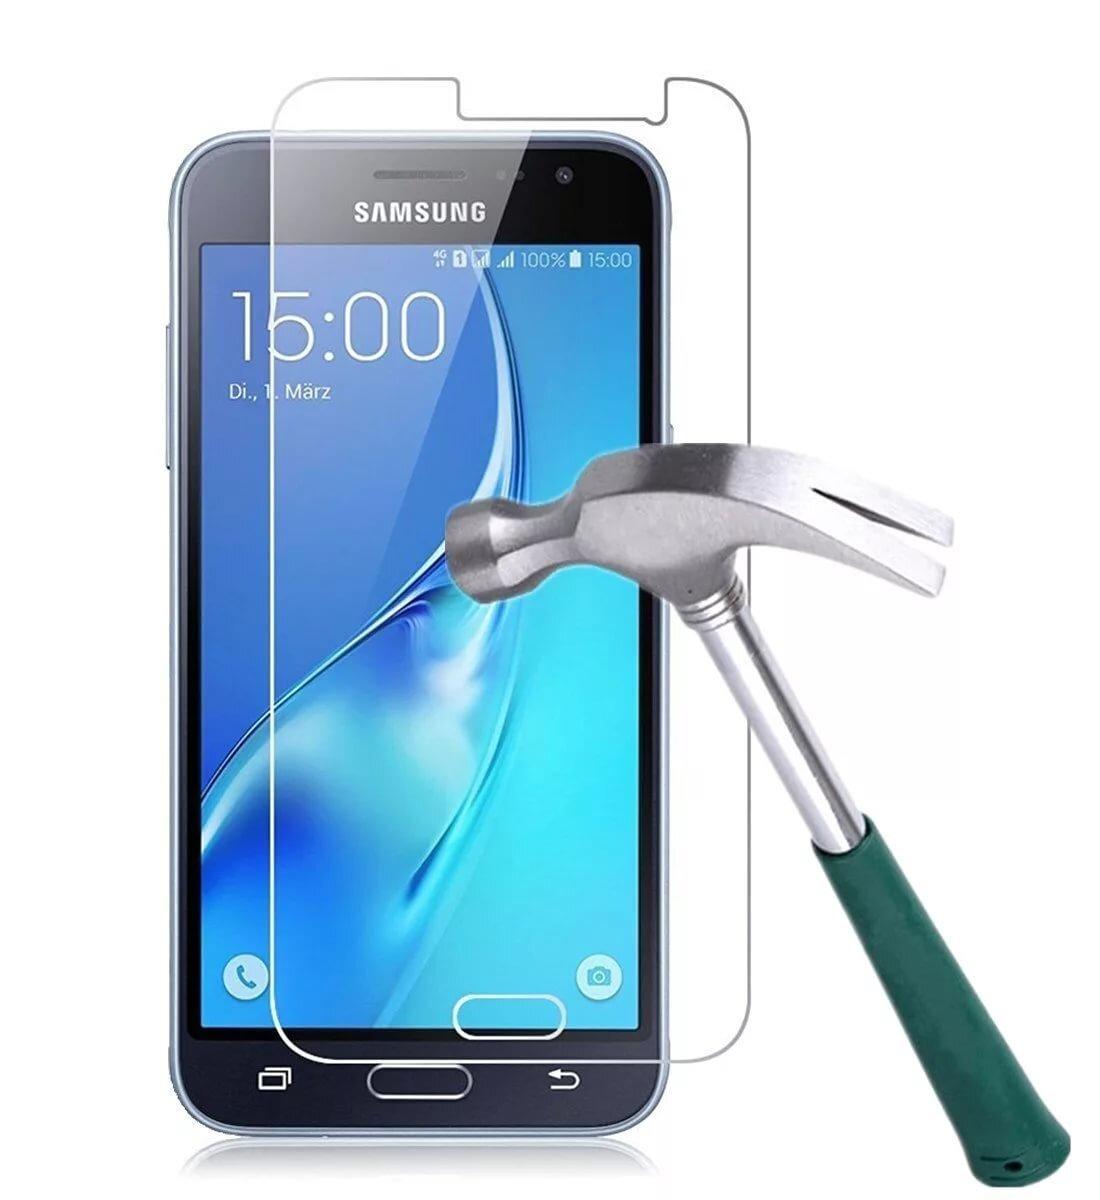 Защитное стекло Samsung Galaxy J1 mini 2016 0.3мм 2.5D - фото pic_e644ea0a30ea432d02ab7941188e5f14_1920x9000_1.jpg